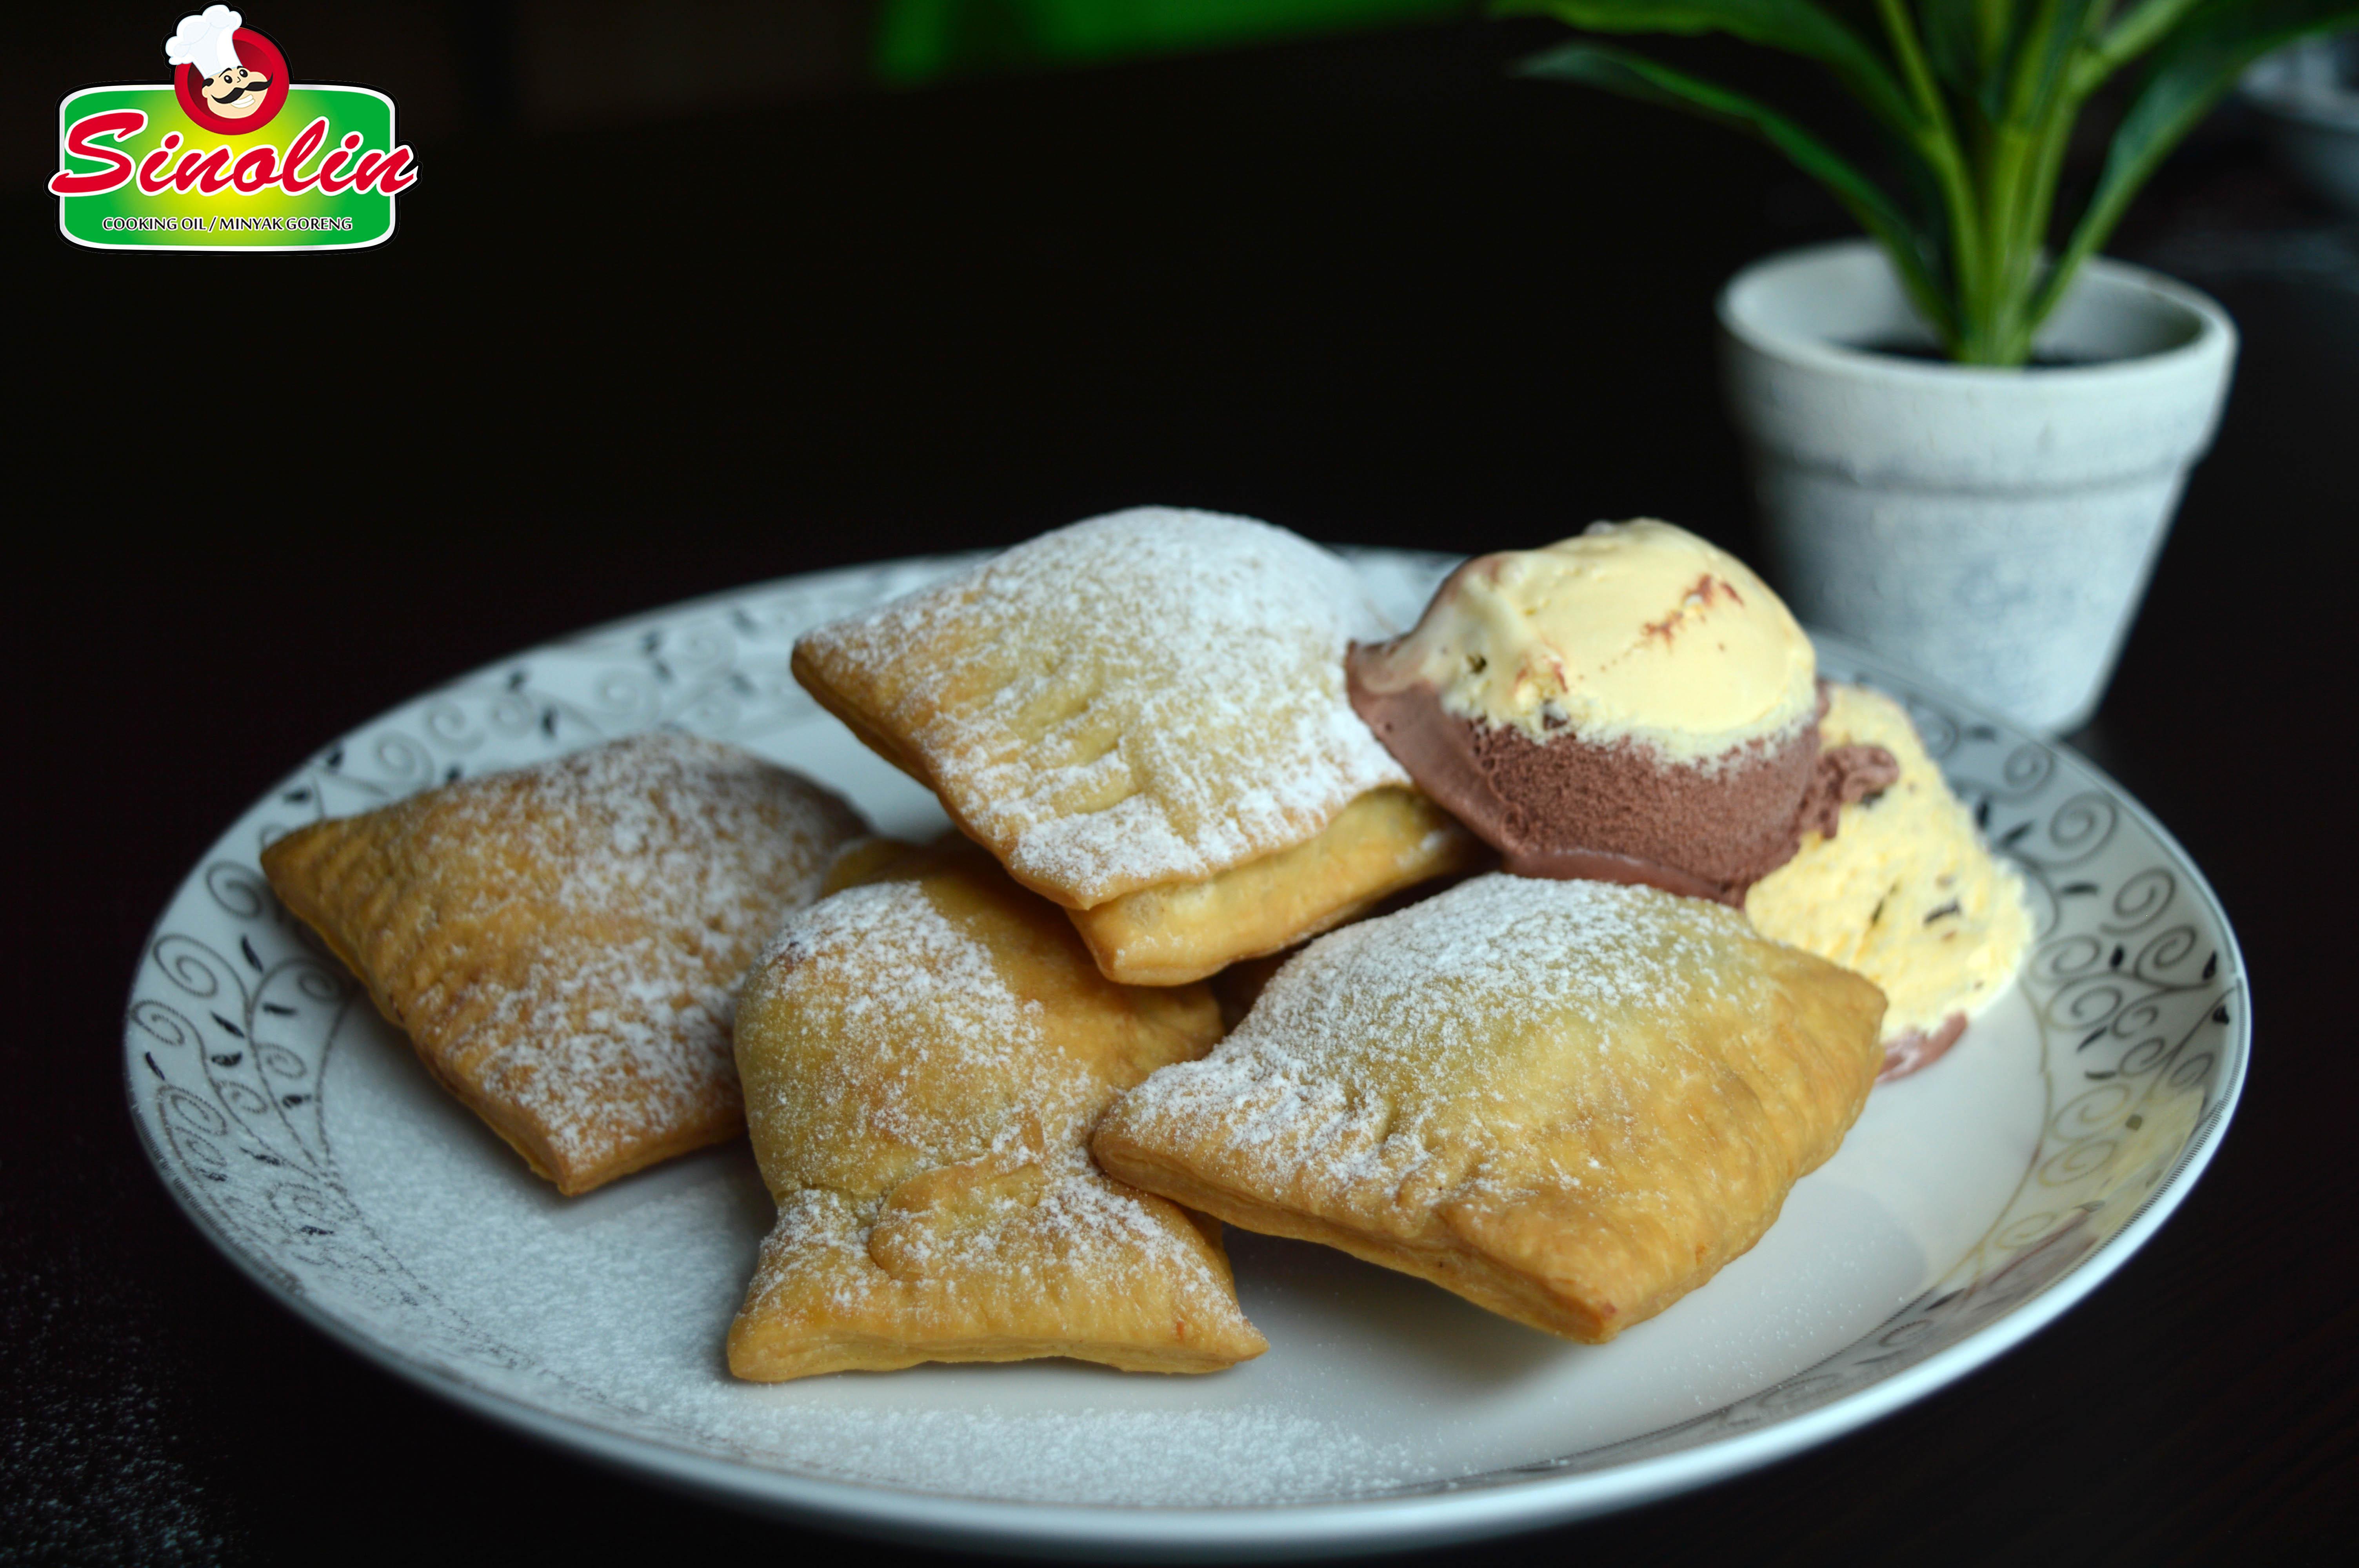 Sweet ravioli with cashew nut and chocolate by Dapur Sinolin